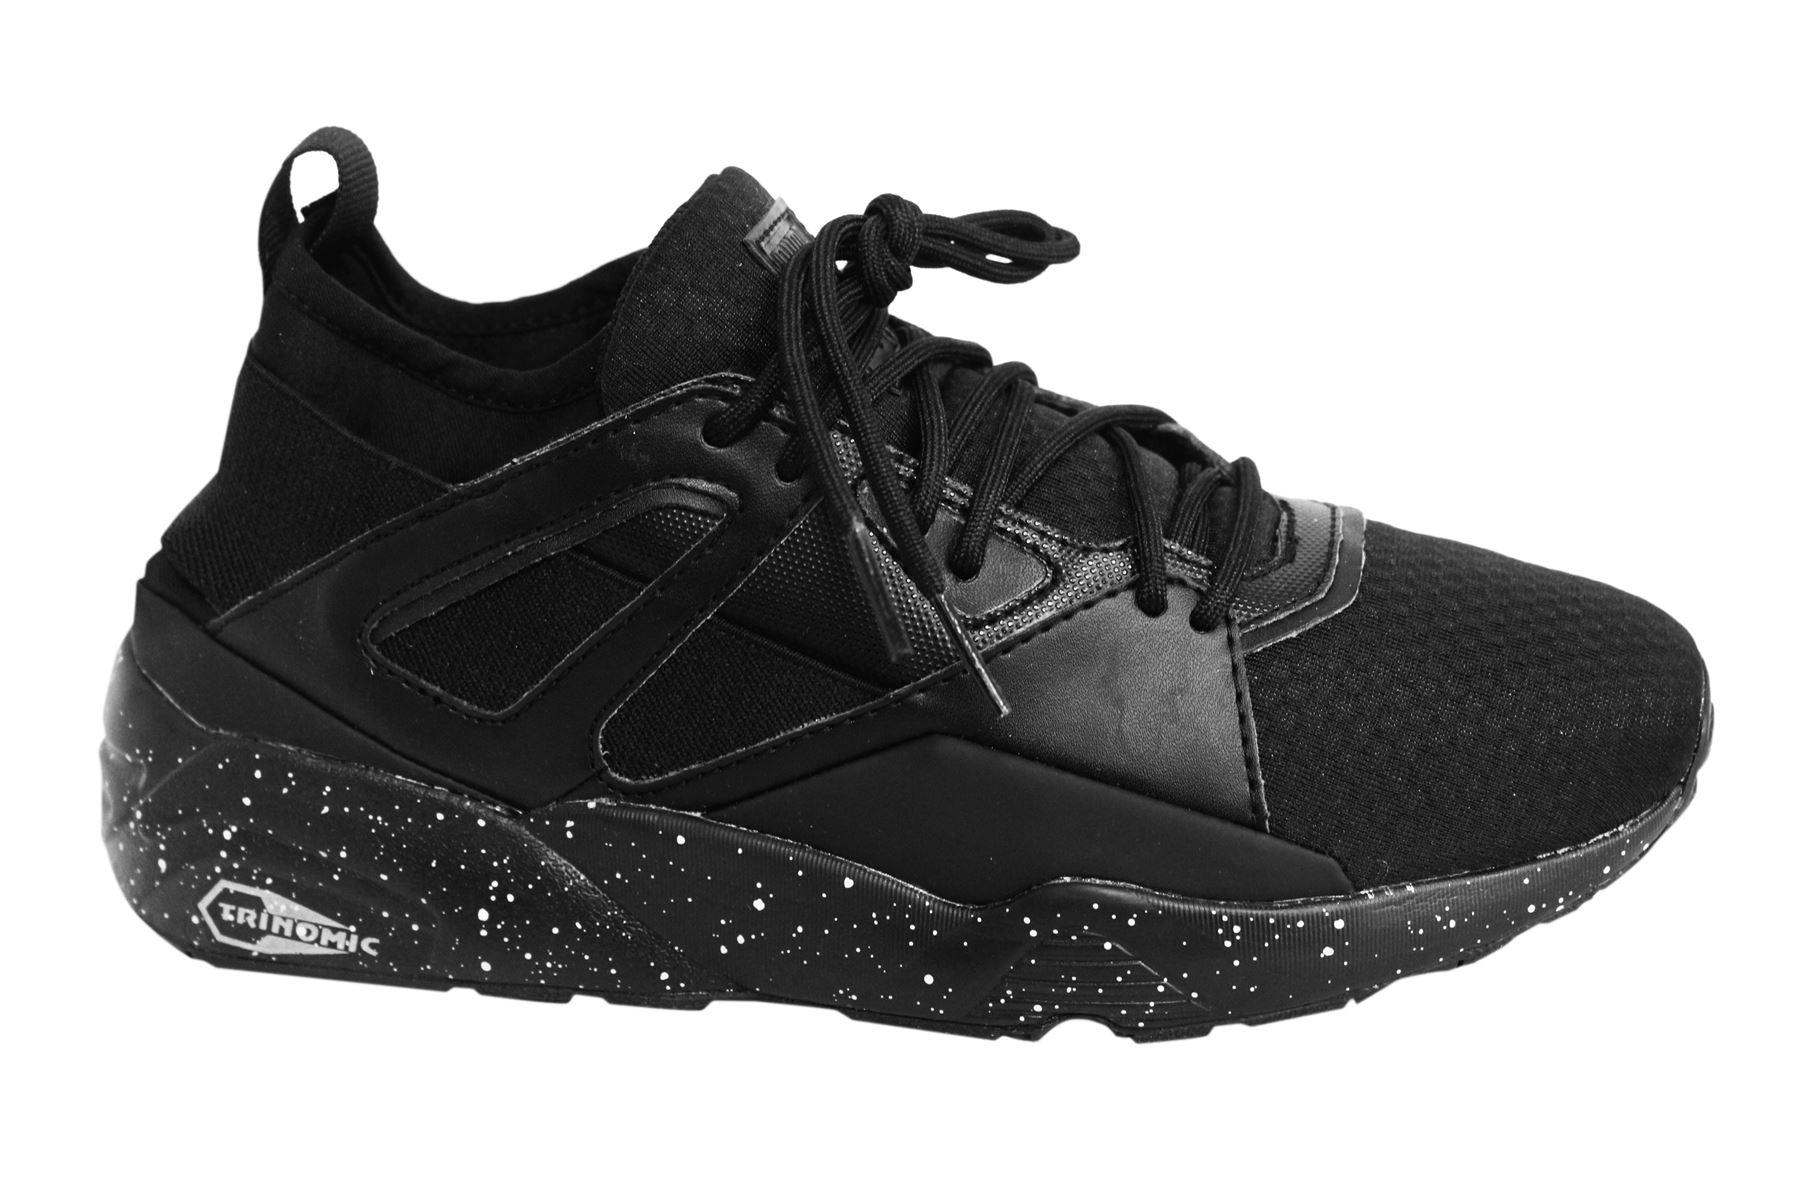 a78978360894 Puma Blaze of Glory Lace Up Black Textile Junior Trainers 363383 01 U107